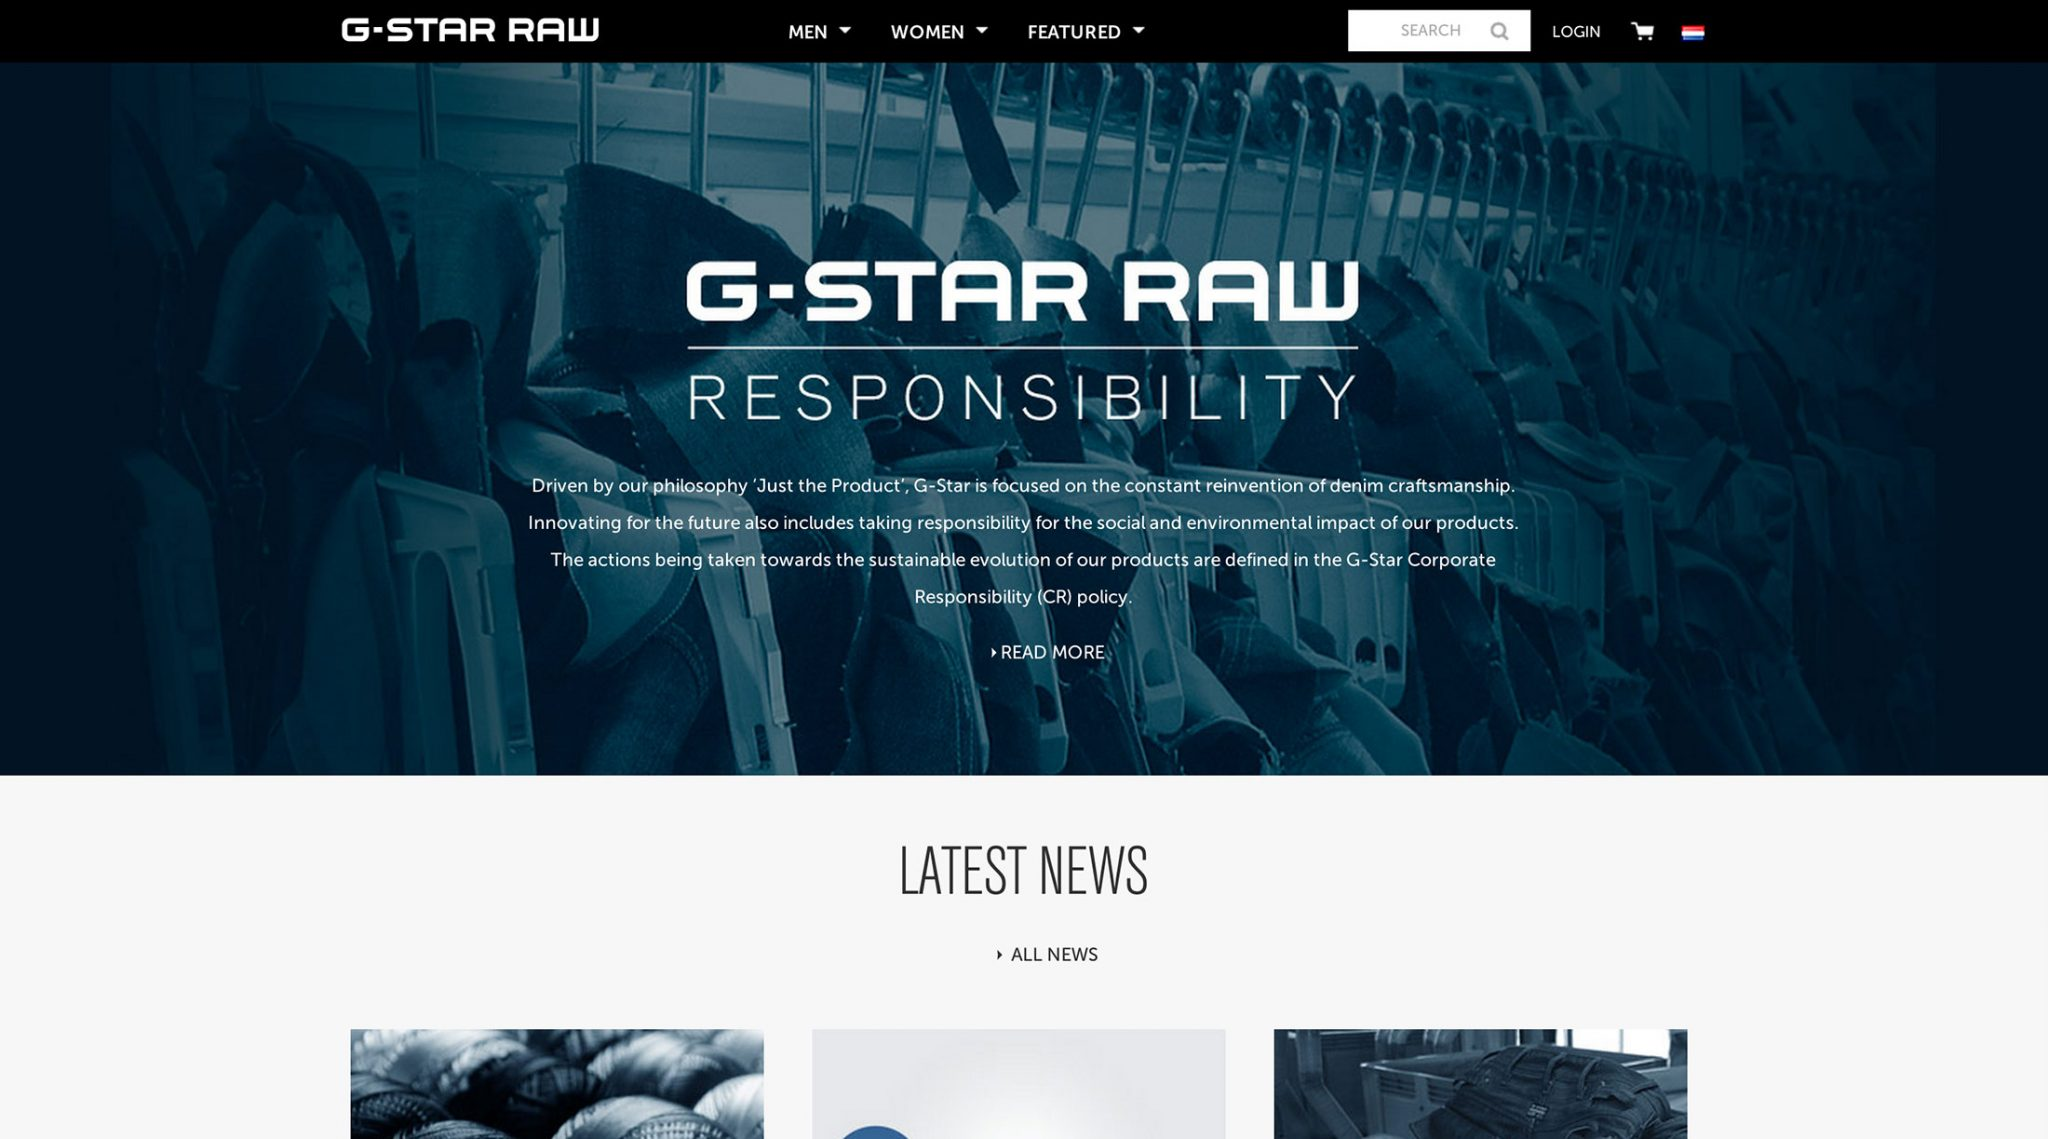 website design inspiration fix for january 31st 2014